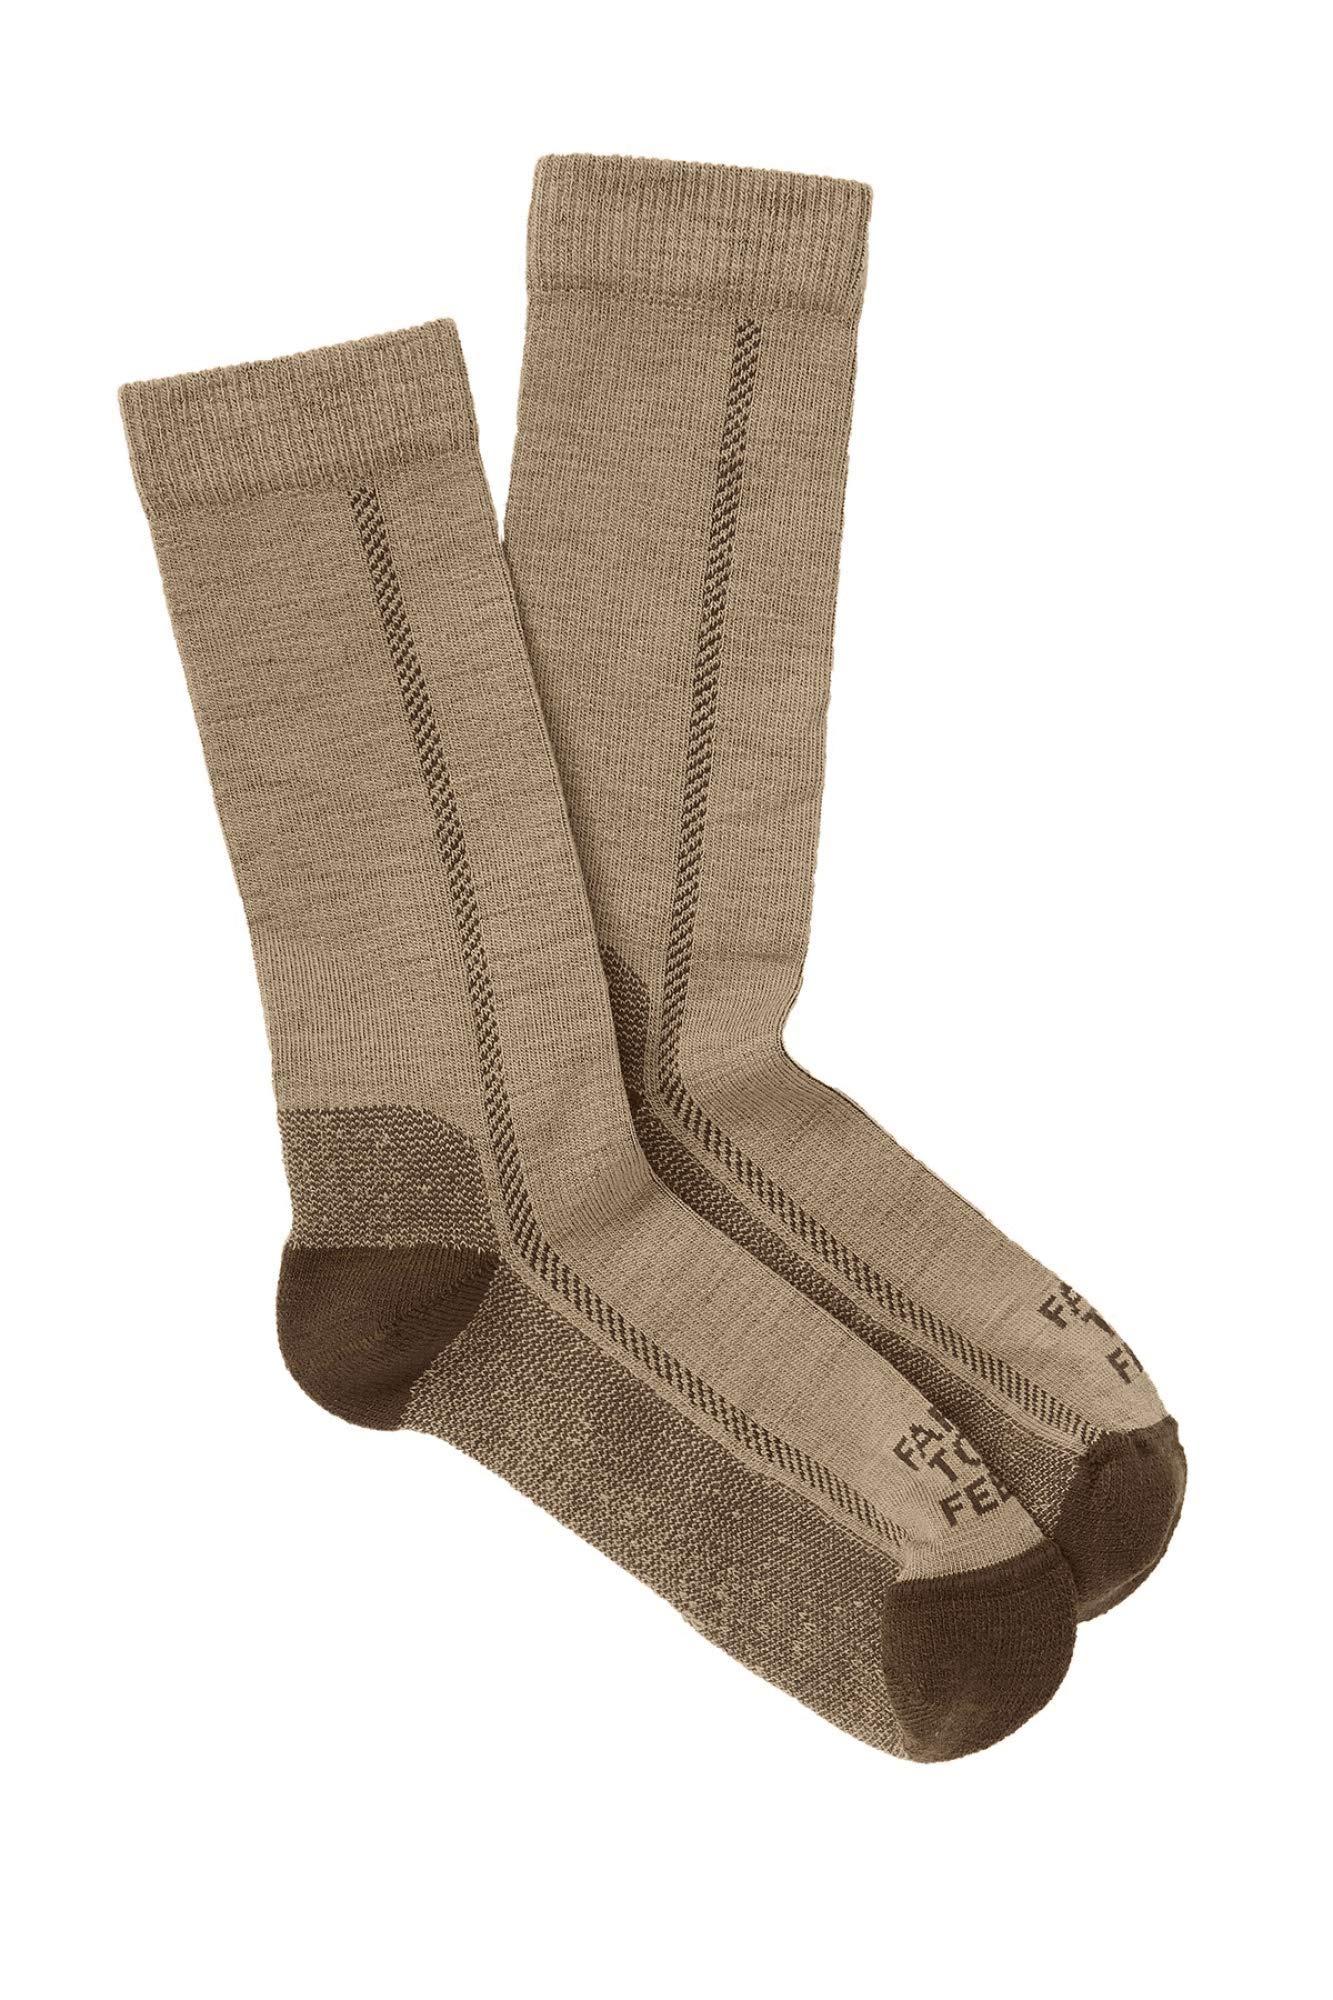 Farm to Feet Mens Madison Lightweight Socks, Desert Tan, Medium by Farm to Feet